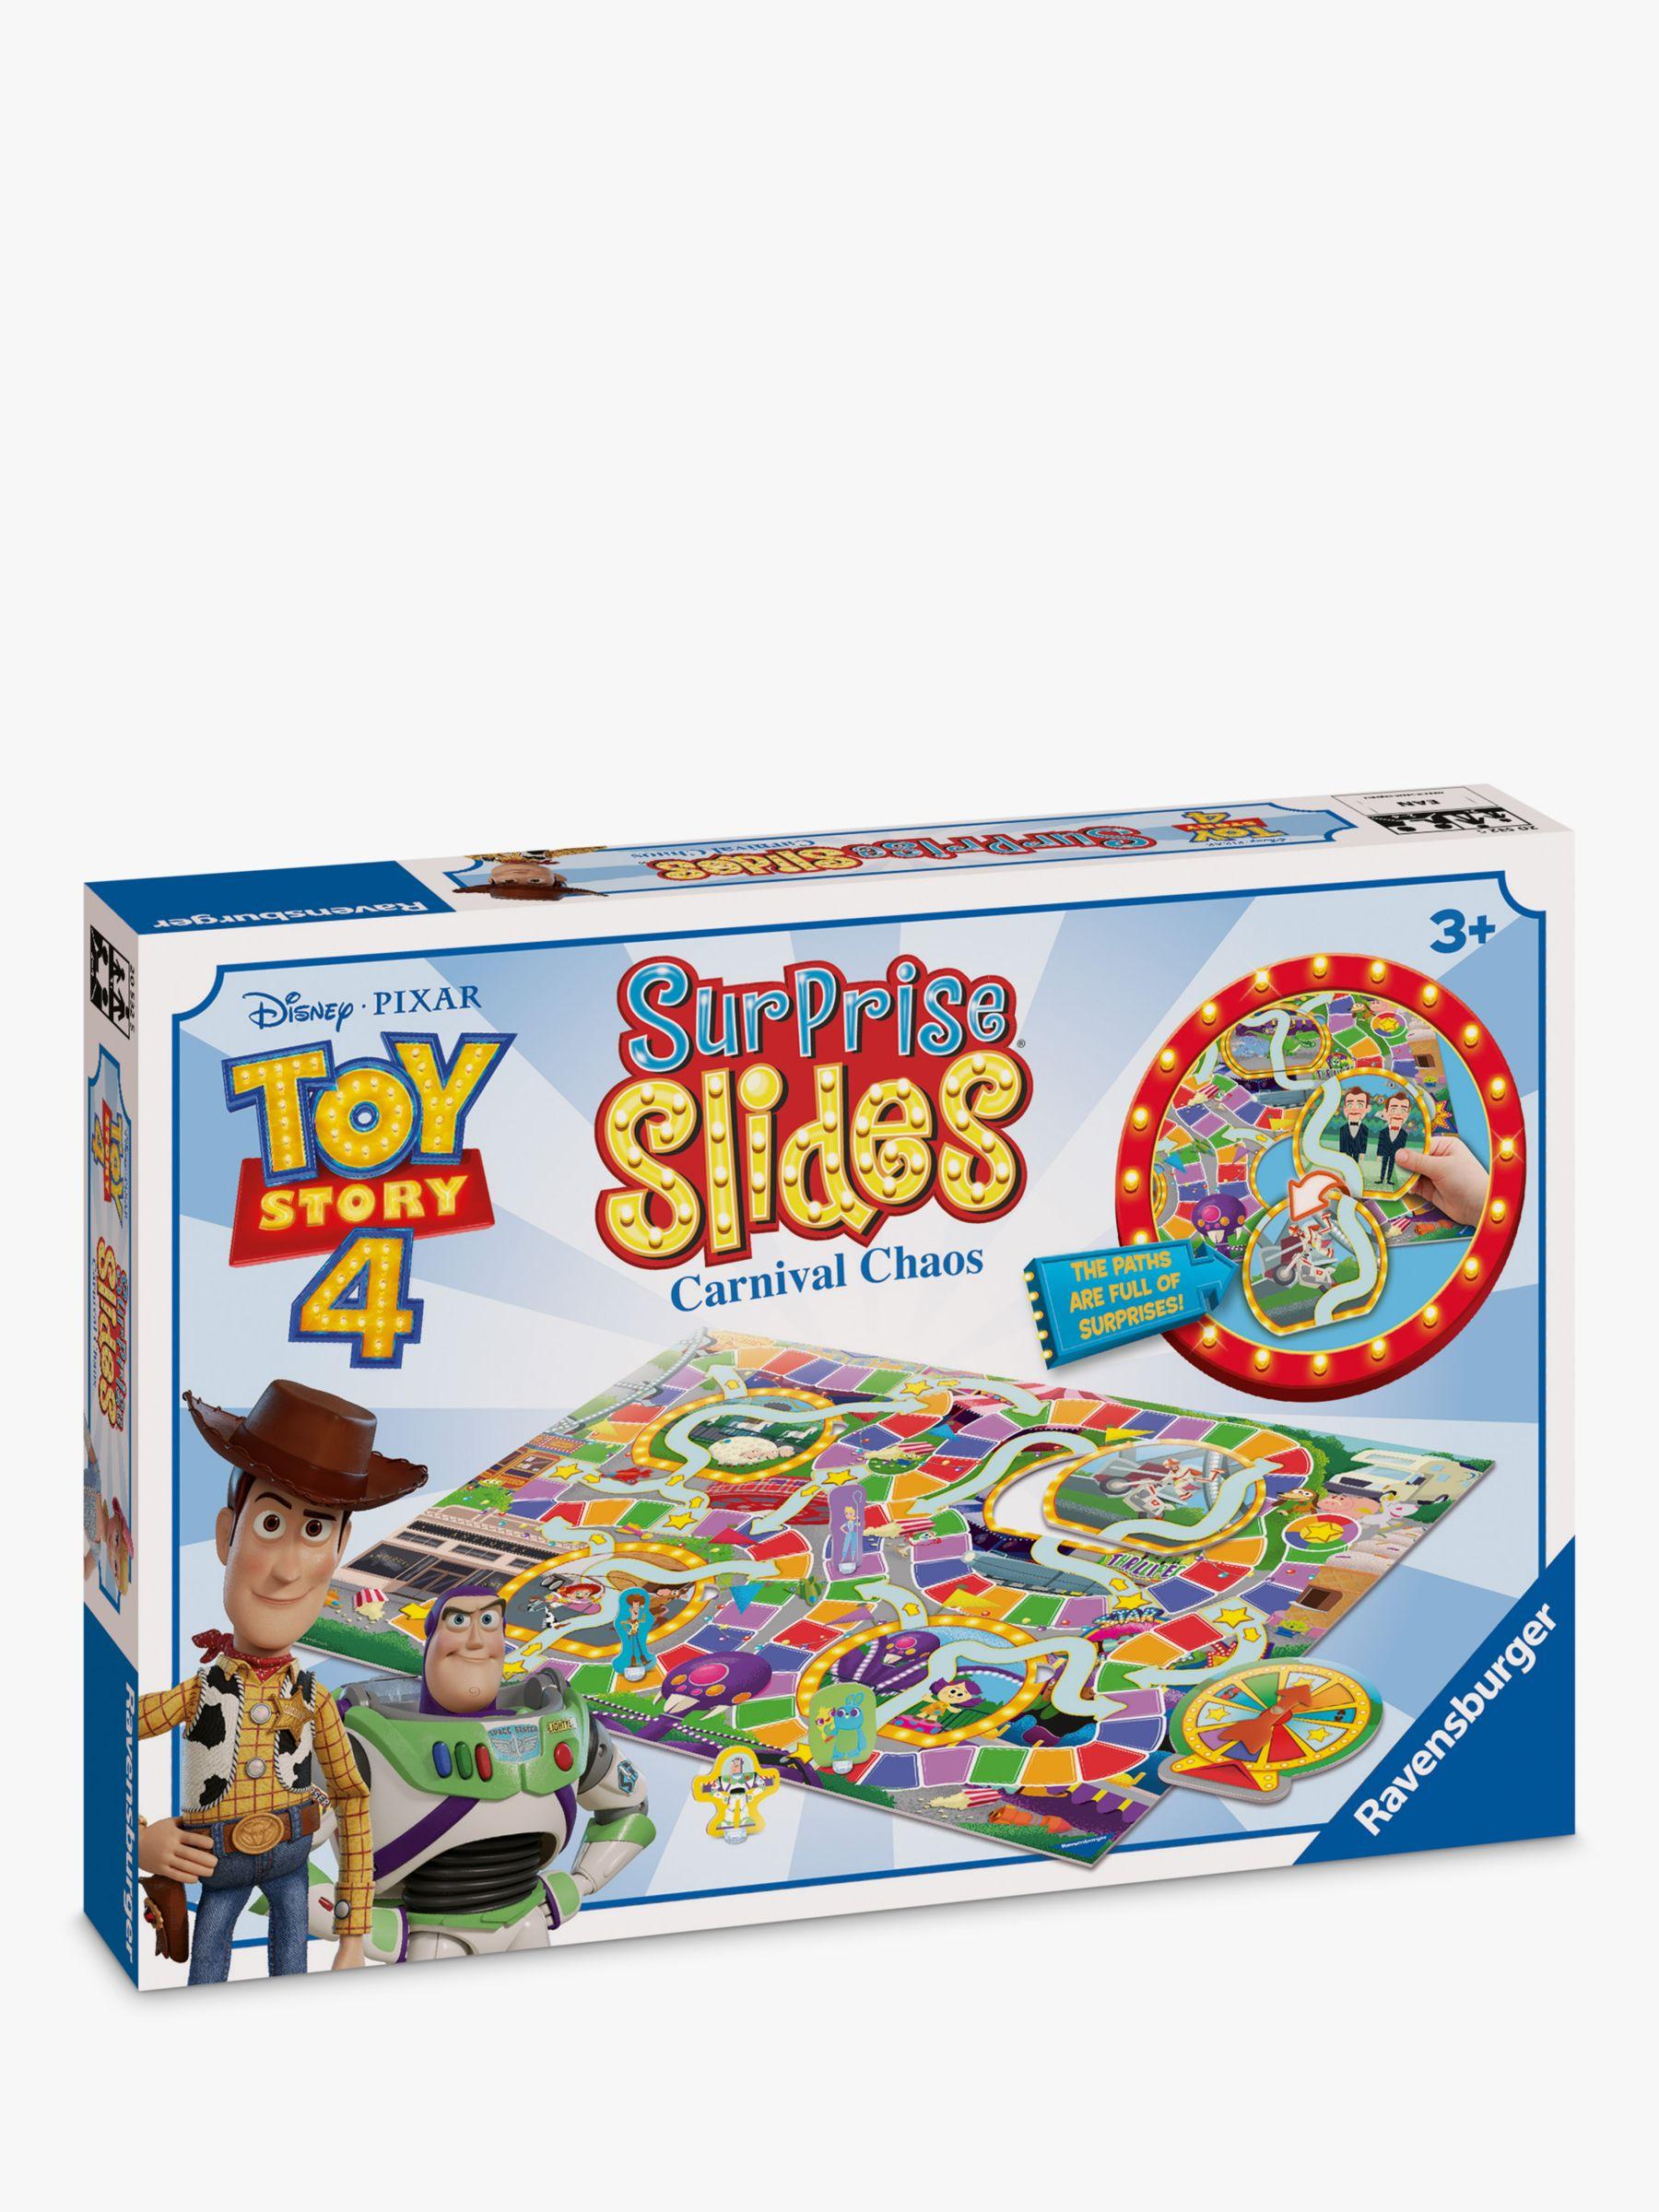 Disney Disney Pixar Toy Story 4 Surprise Slides Carnival Chaos Board Game